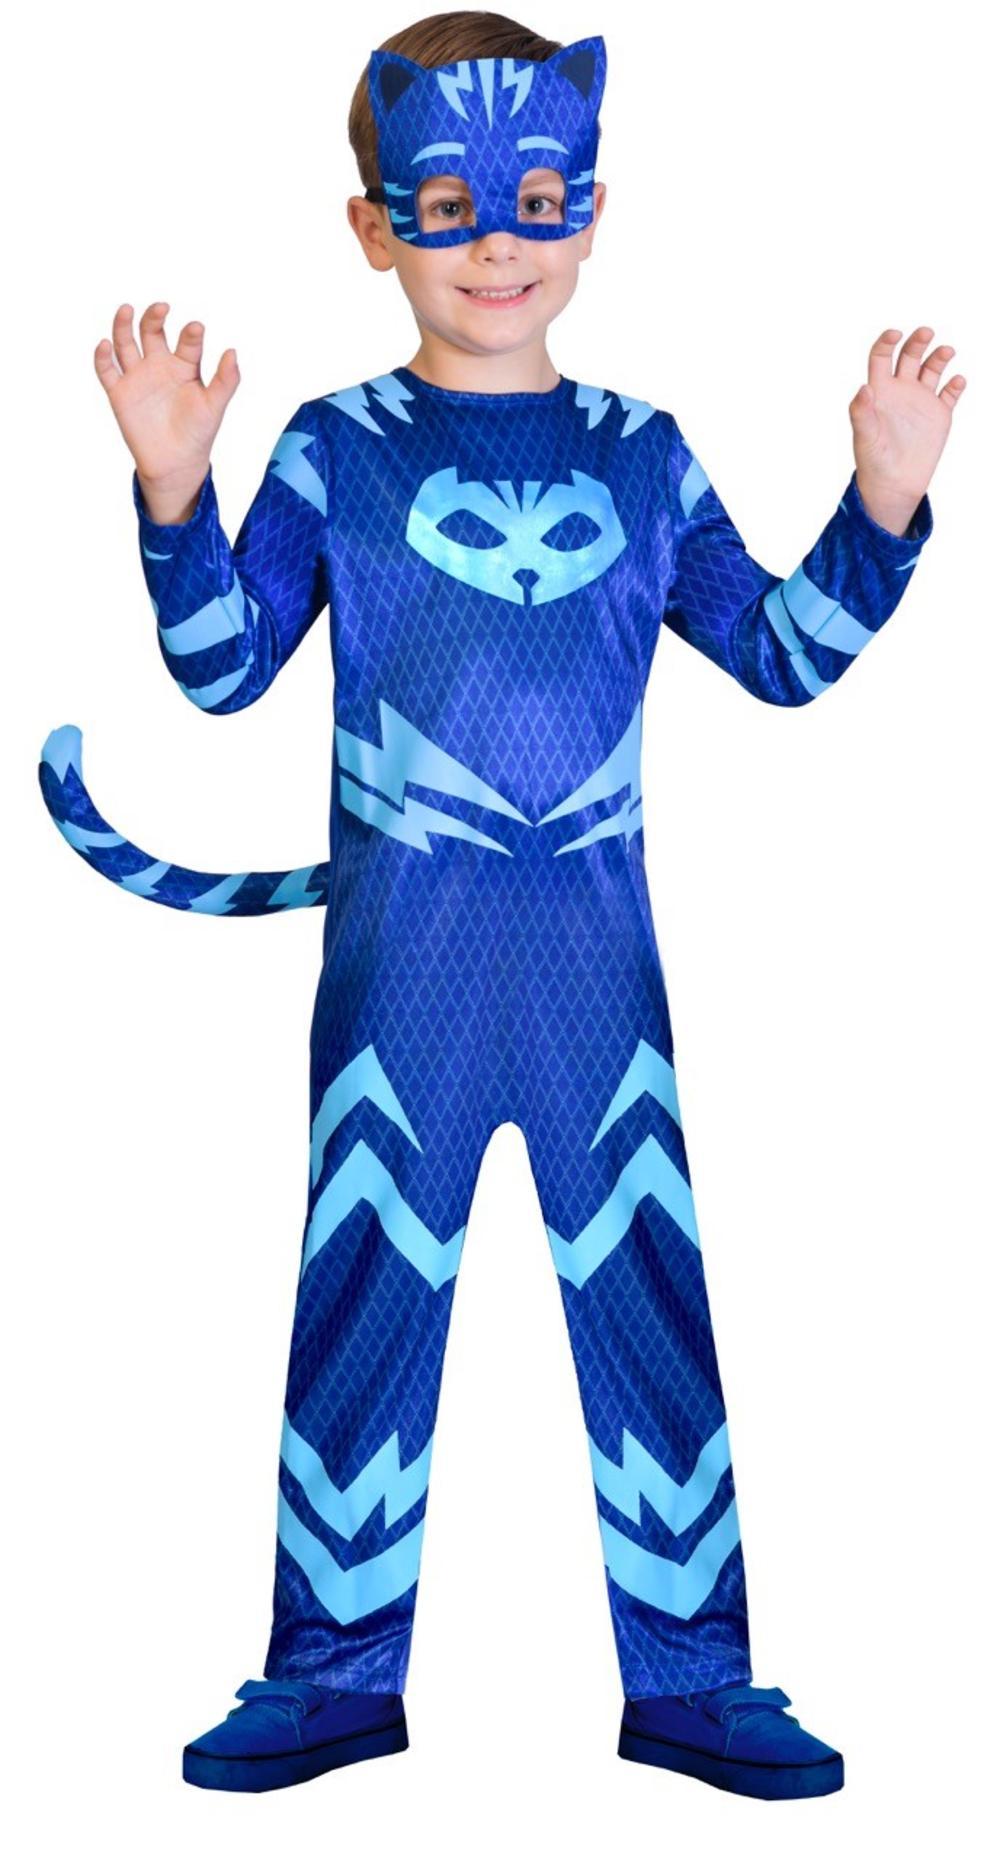 Gekko Boys Fancy Dress PJ Masks Superhero Gecko Cartoon Kids Childrens Costume